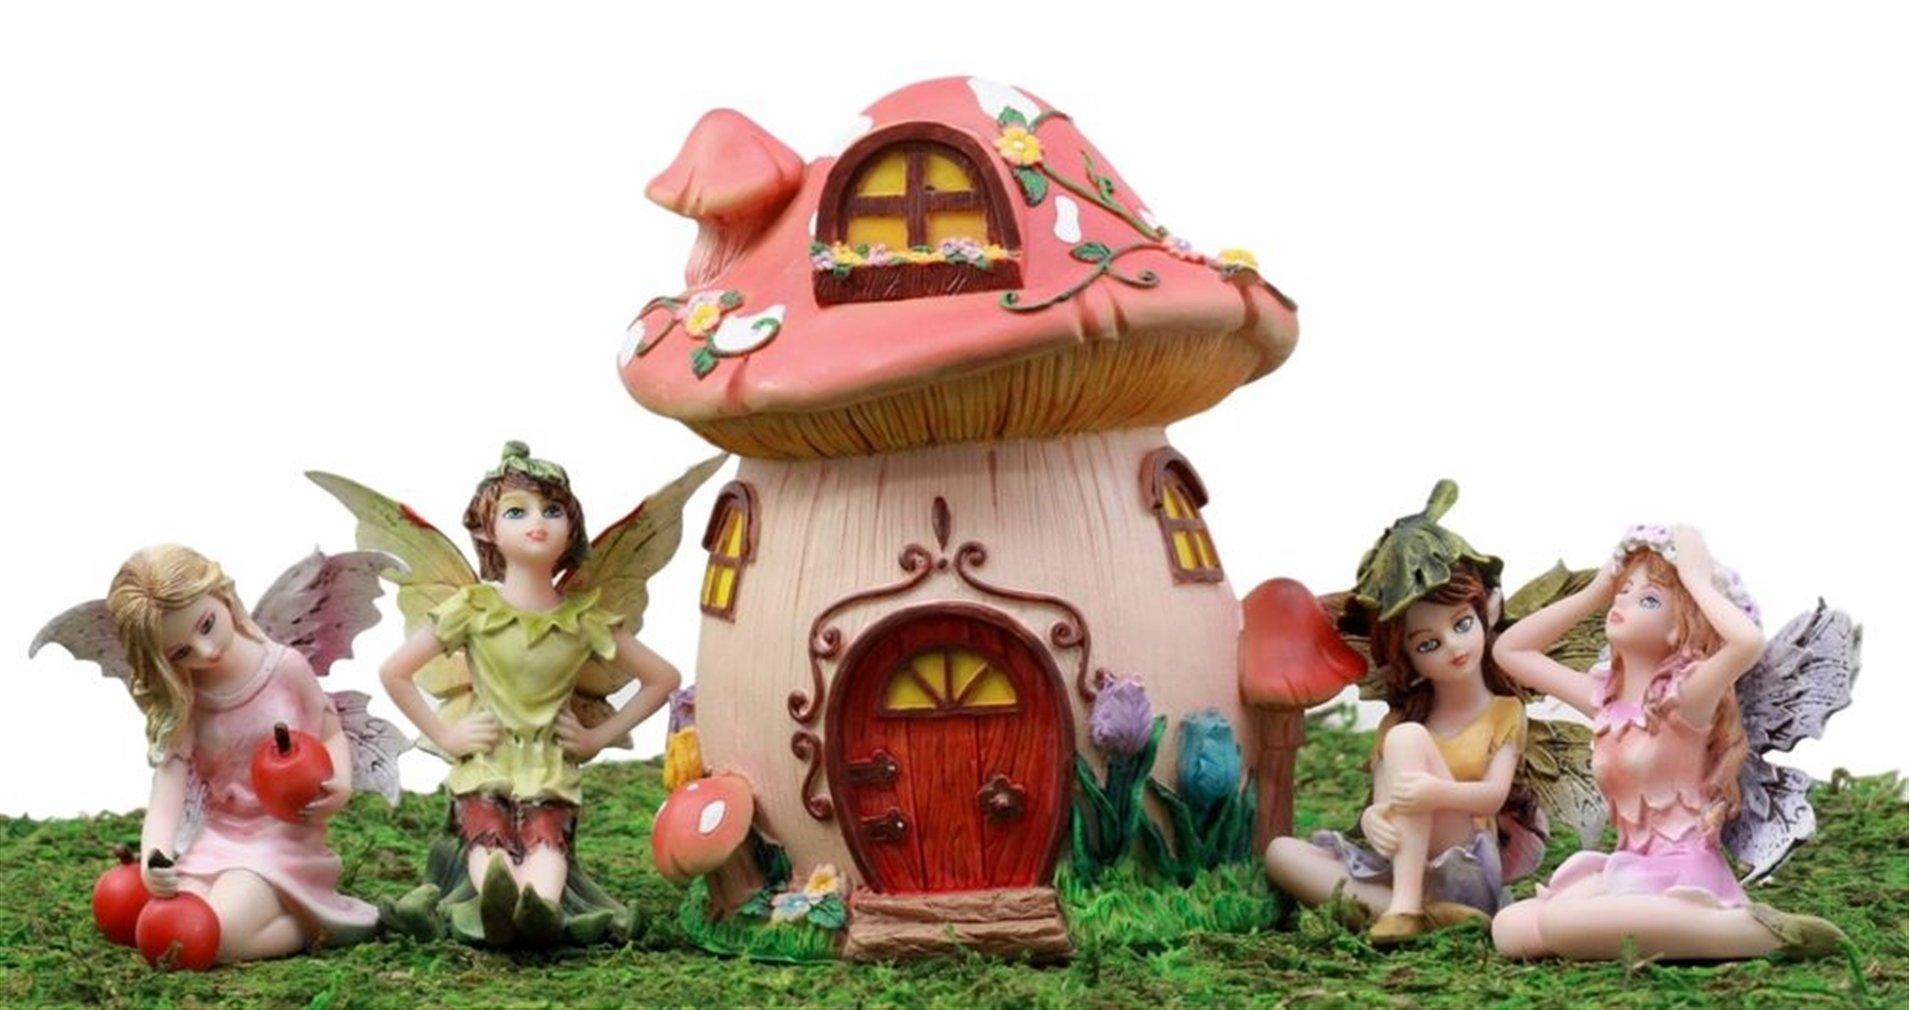 Ky & Co YesKela Fairy Garden Starter Kit Mushroom Cottage & Fairy Miniature Figurines Set of 5